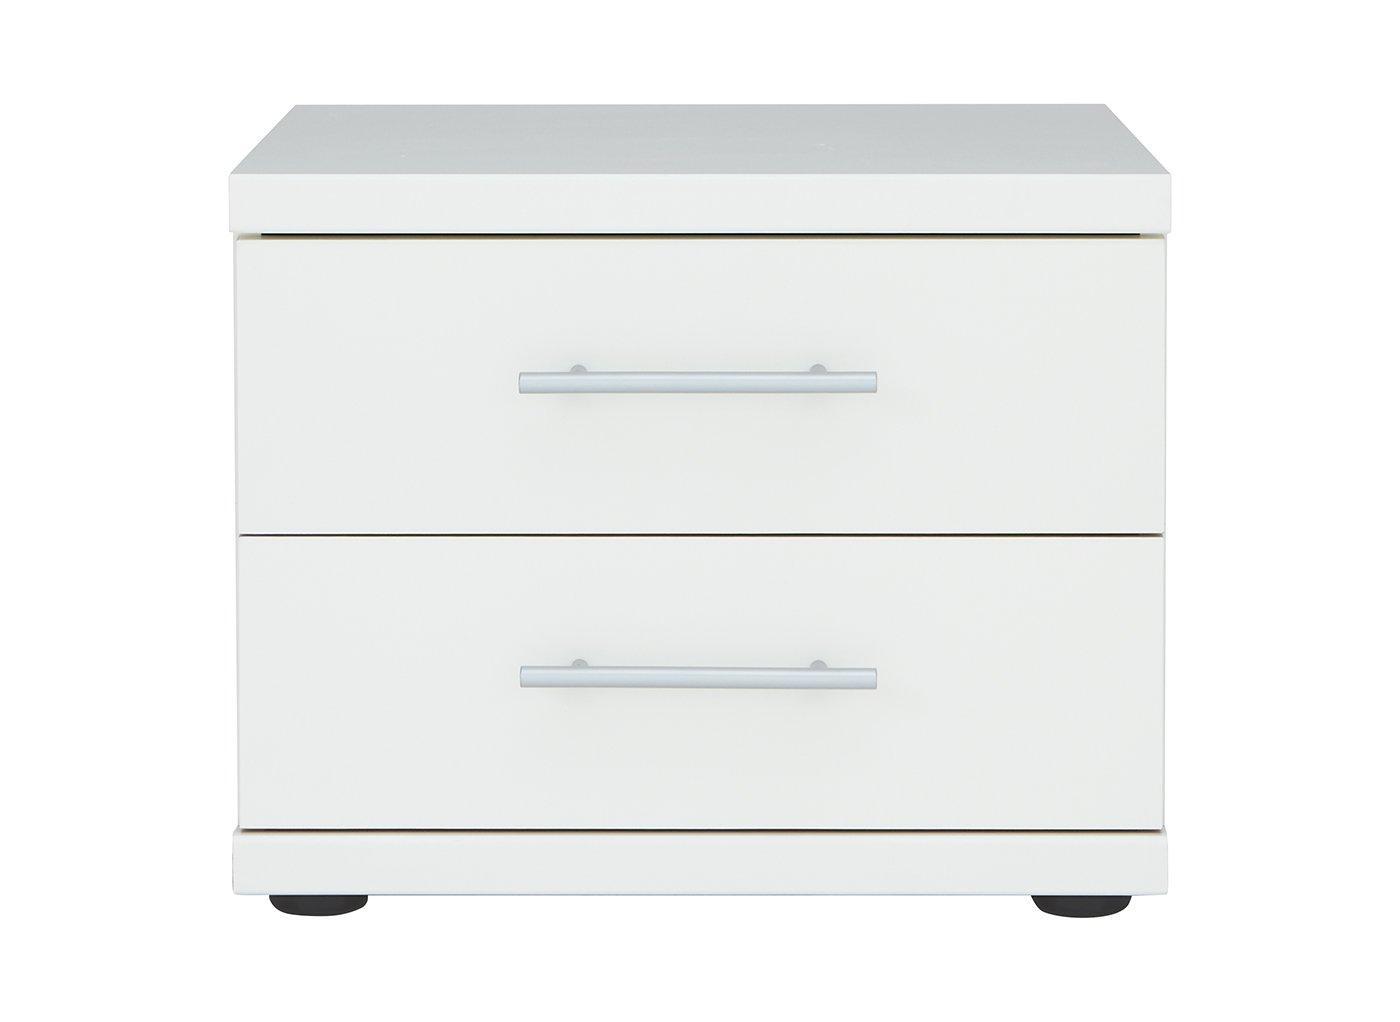 983478517ad Samara 2 Drawer Bedside Chest - White